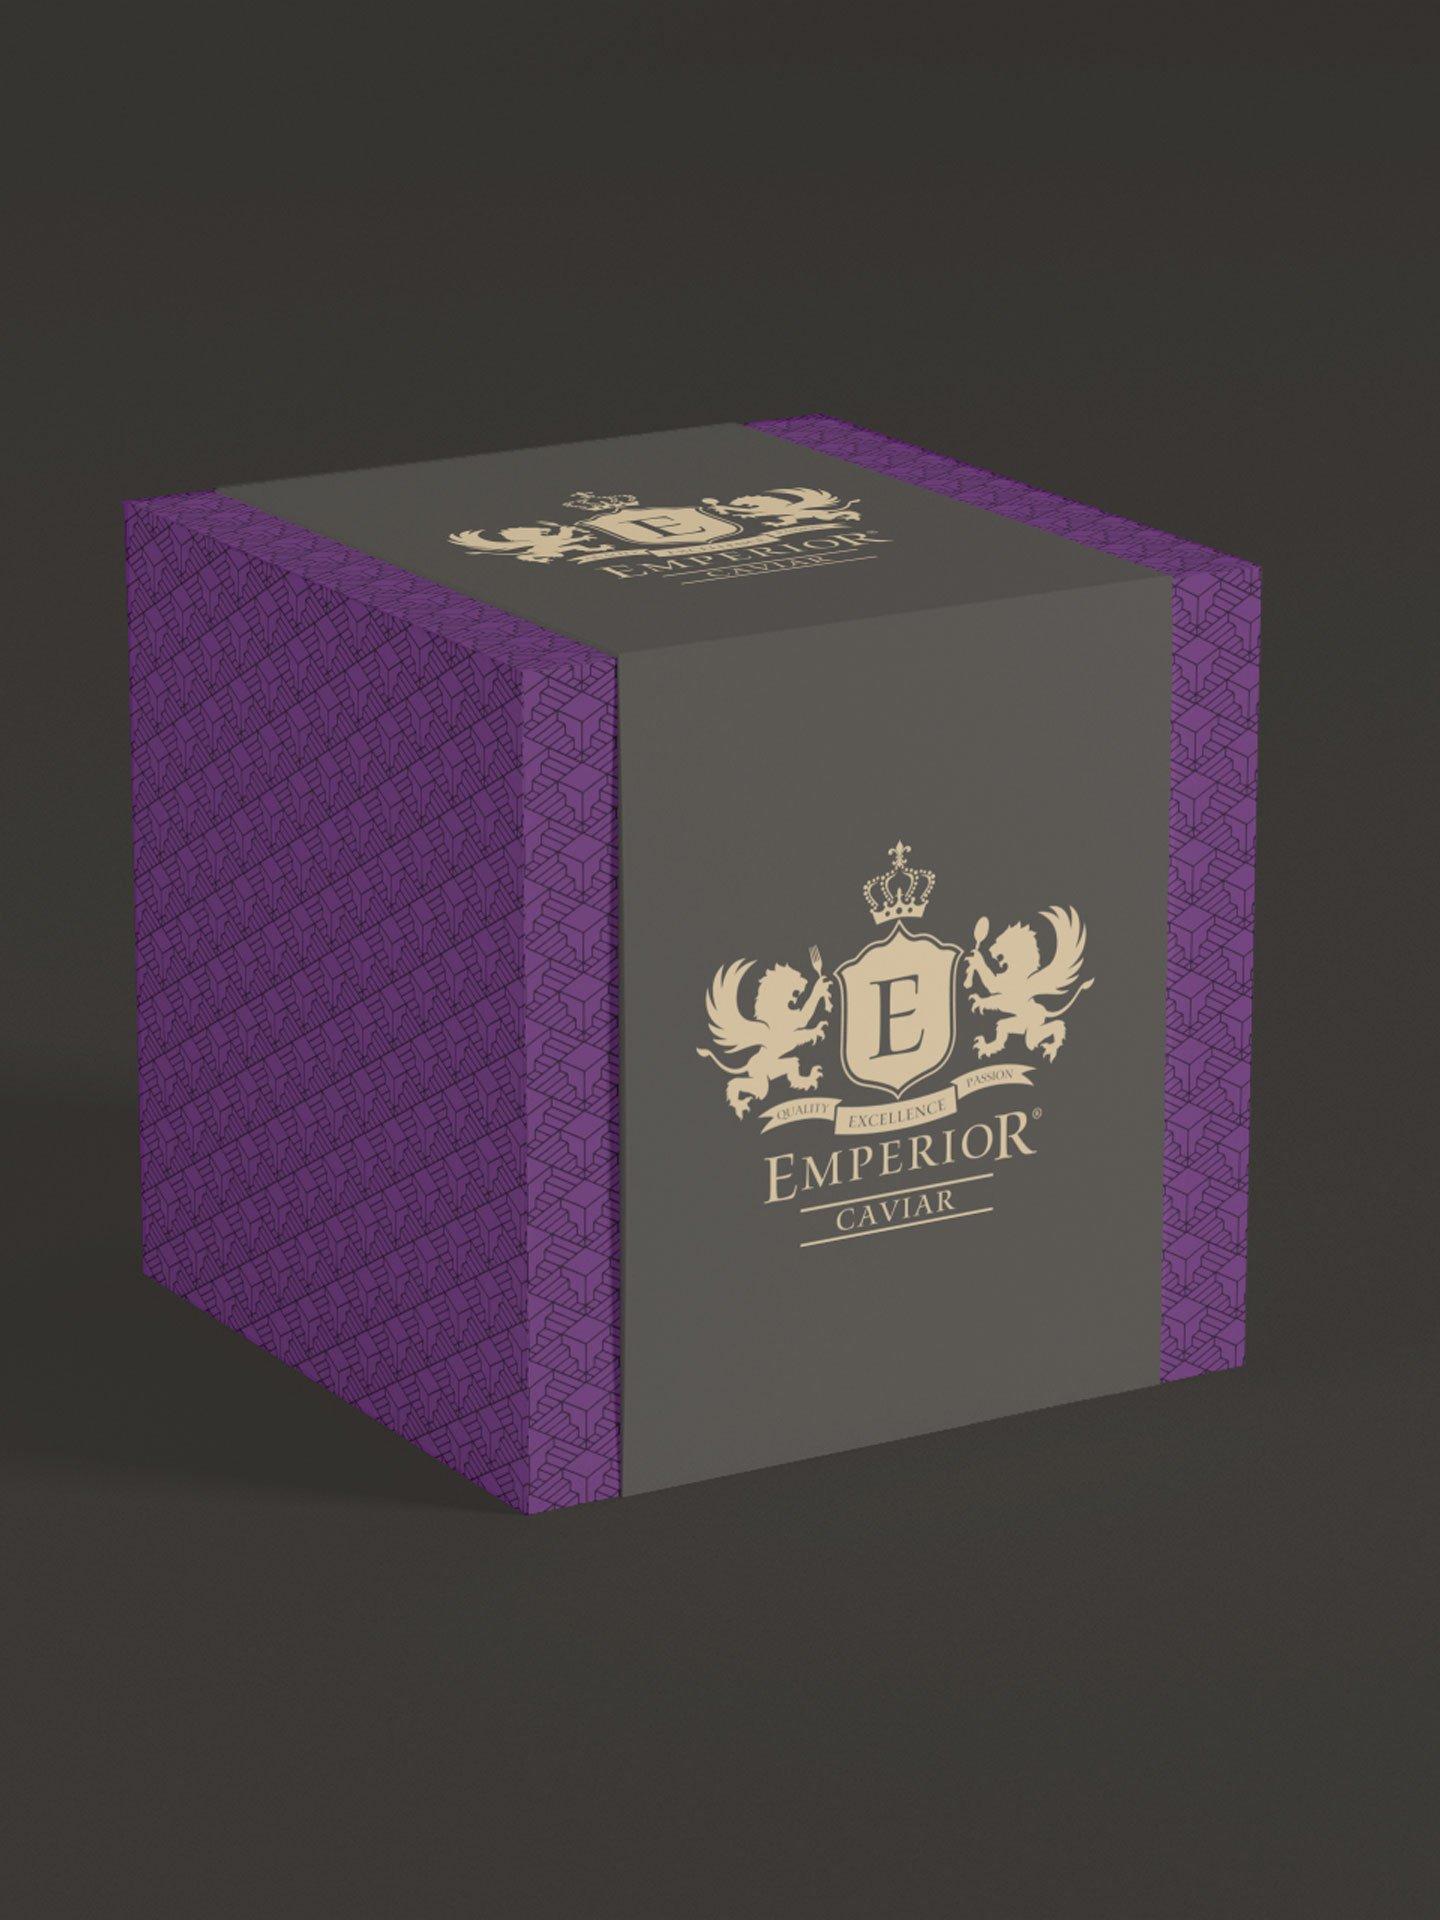 Emperior Gourmet Brand (Caviar Gift Box)